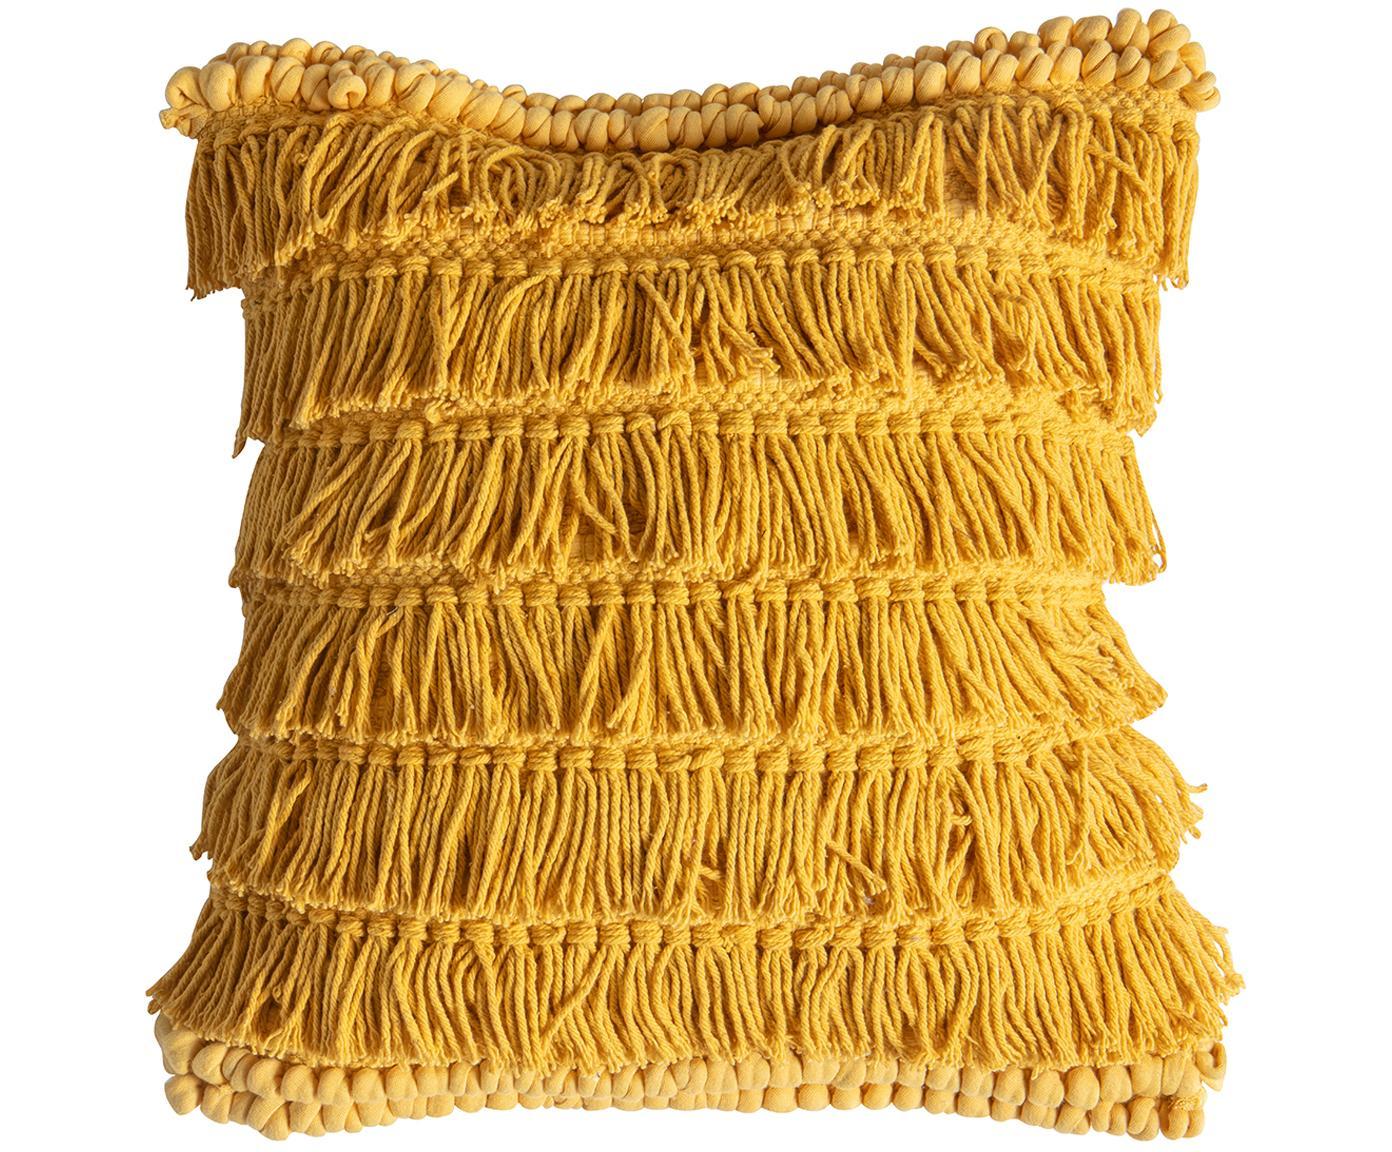 Cojín Tallara, estilo boho, con relleno, Funda: 100%algodón reciclado, Ocre, An 45 x L 45 cm